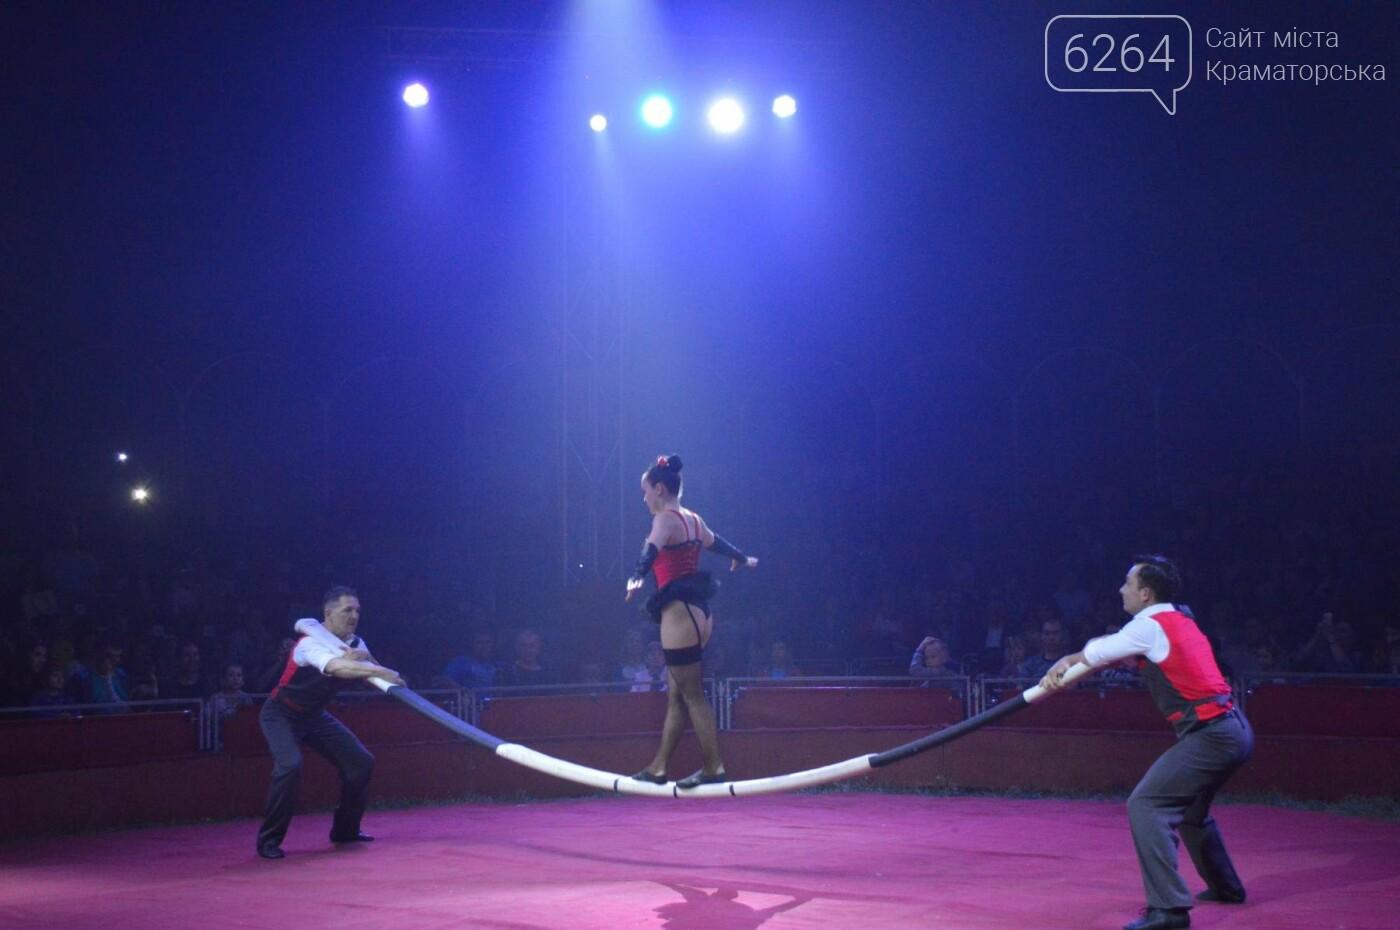 Новое шоу цирка «Кобзов» произвело фурор в Краматорске, фото-7